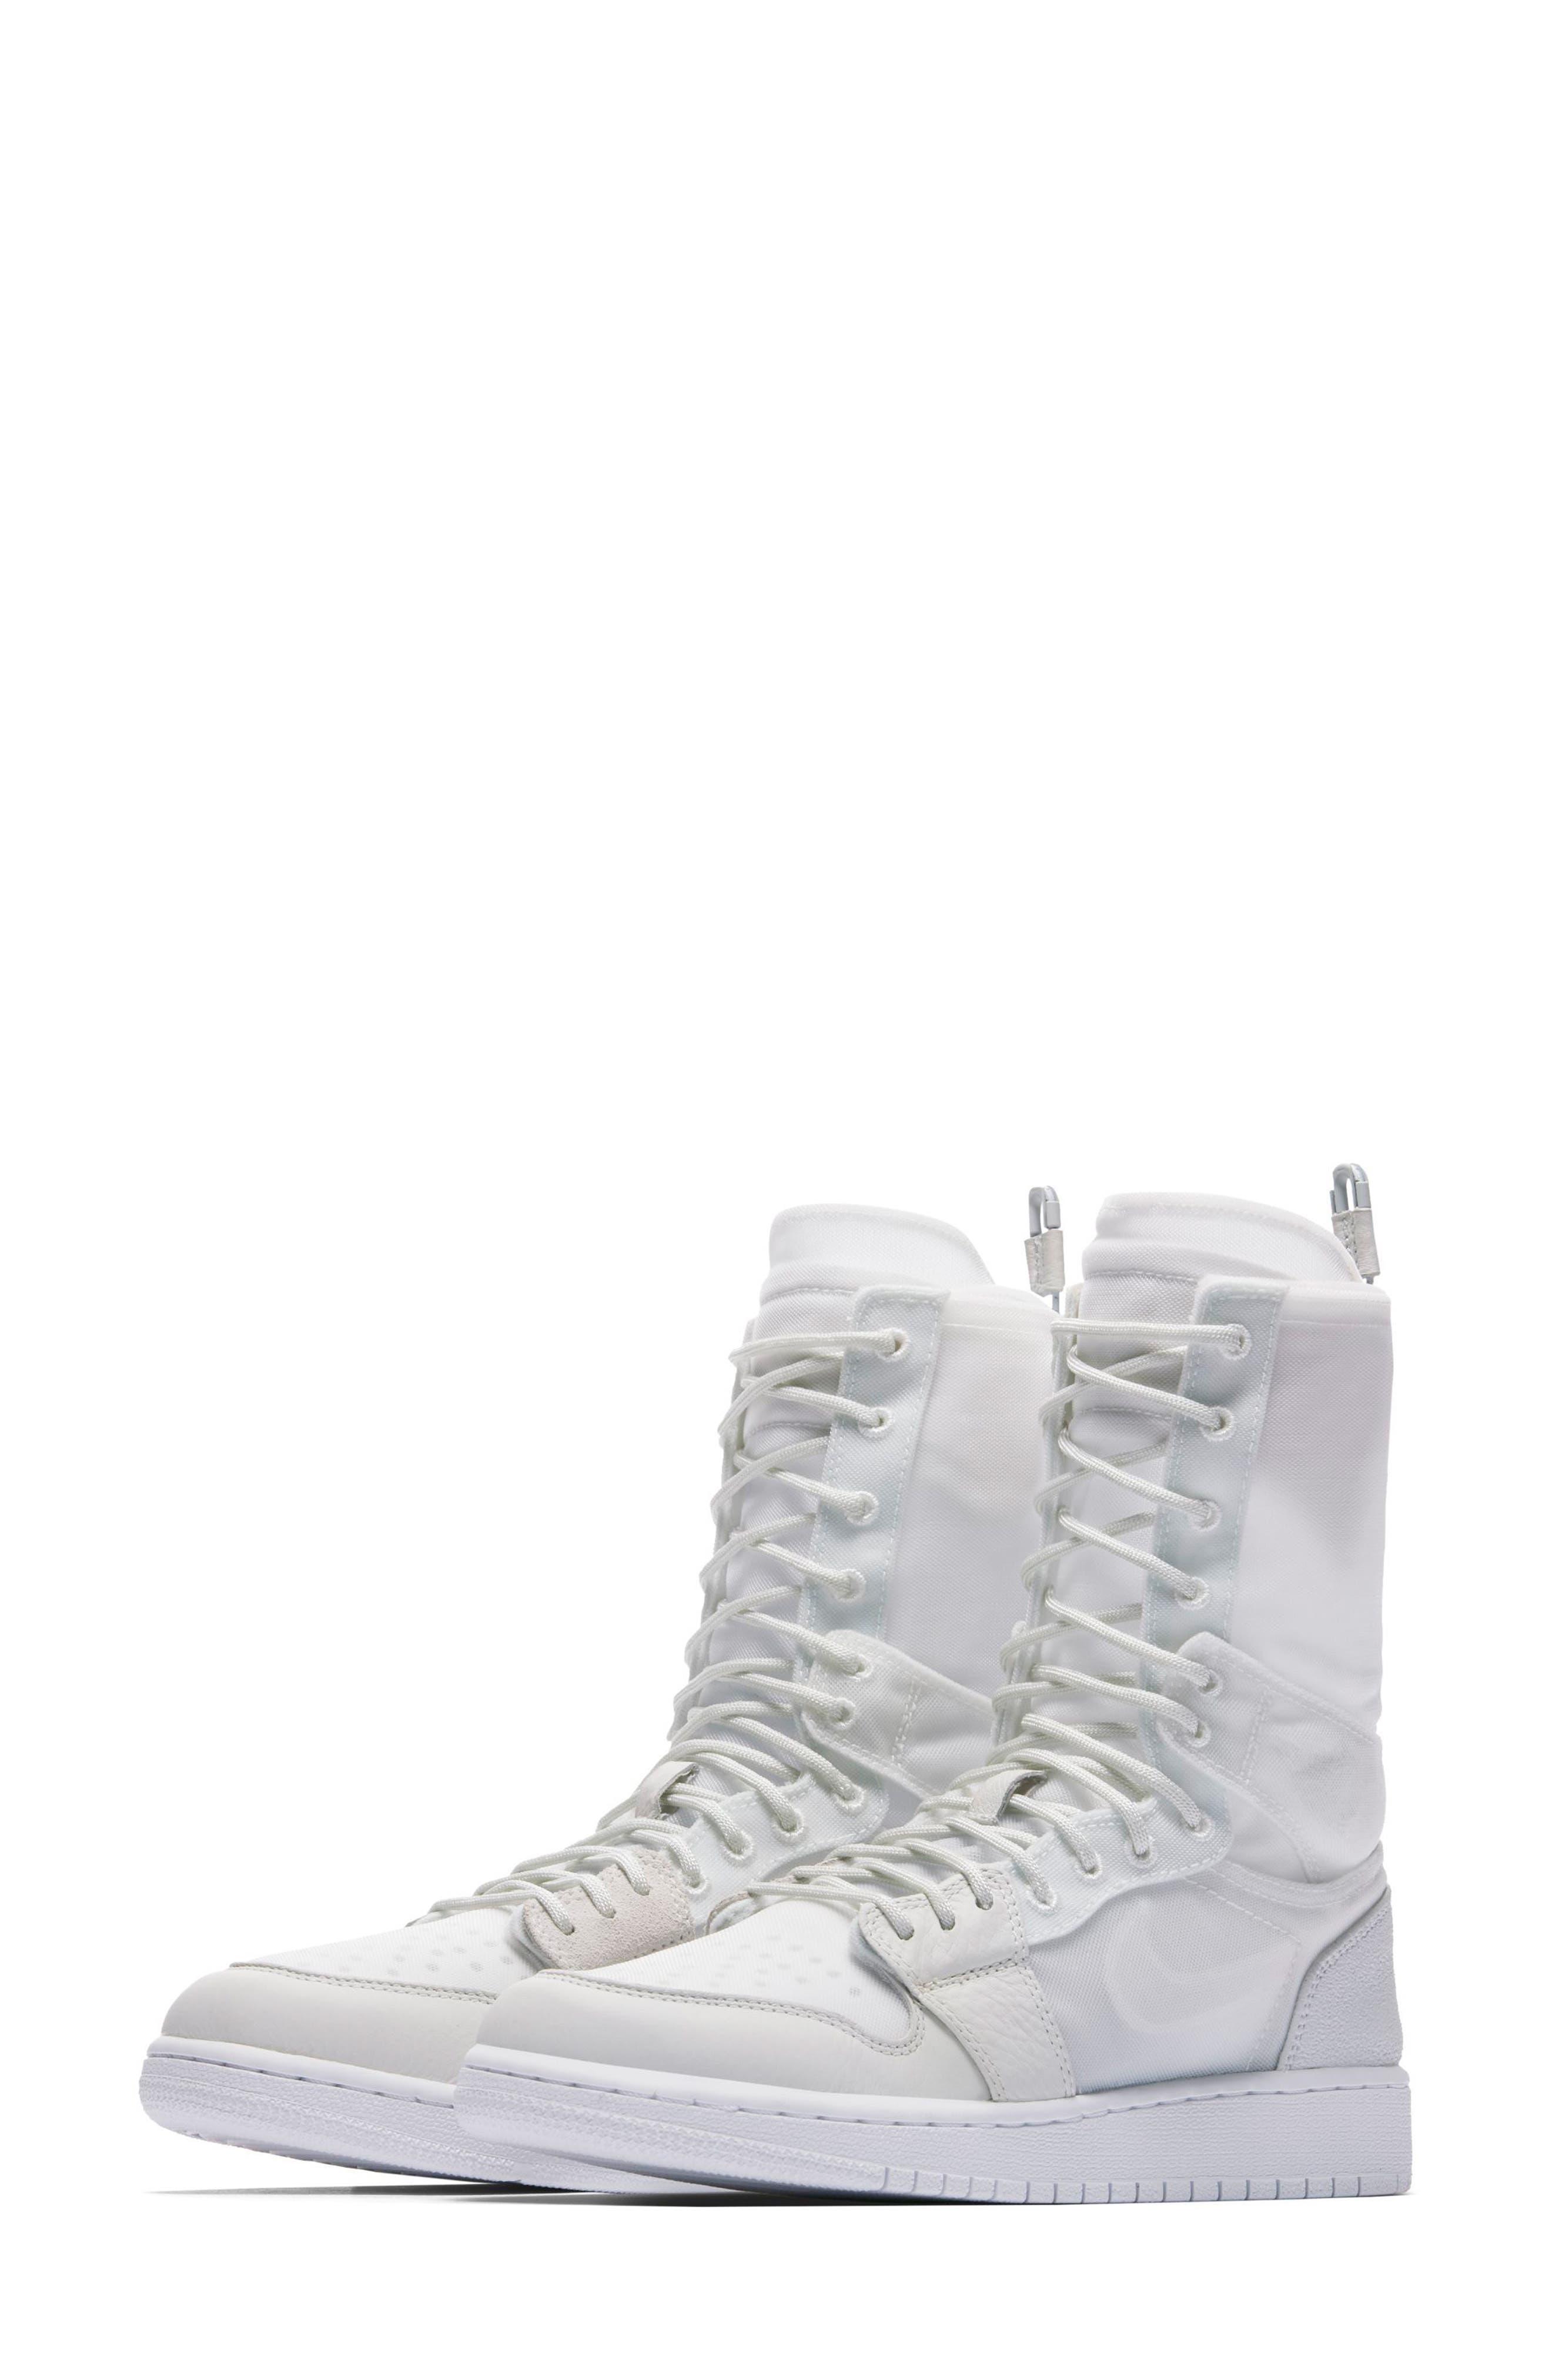 Air Jordan 1 Explorer XX Convertible High Top Sneaker,                             Main thumbnail 1, color,                             Off White/ Off White